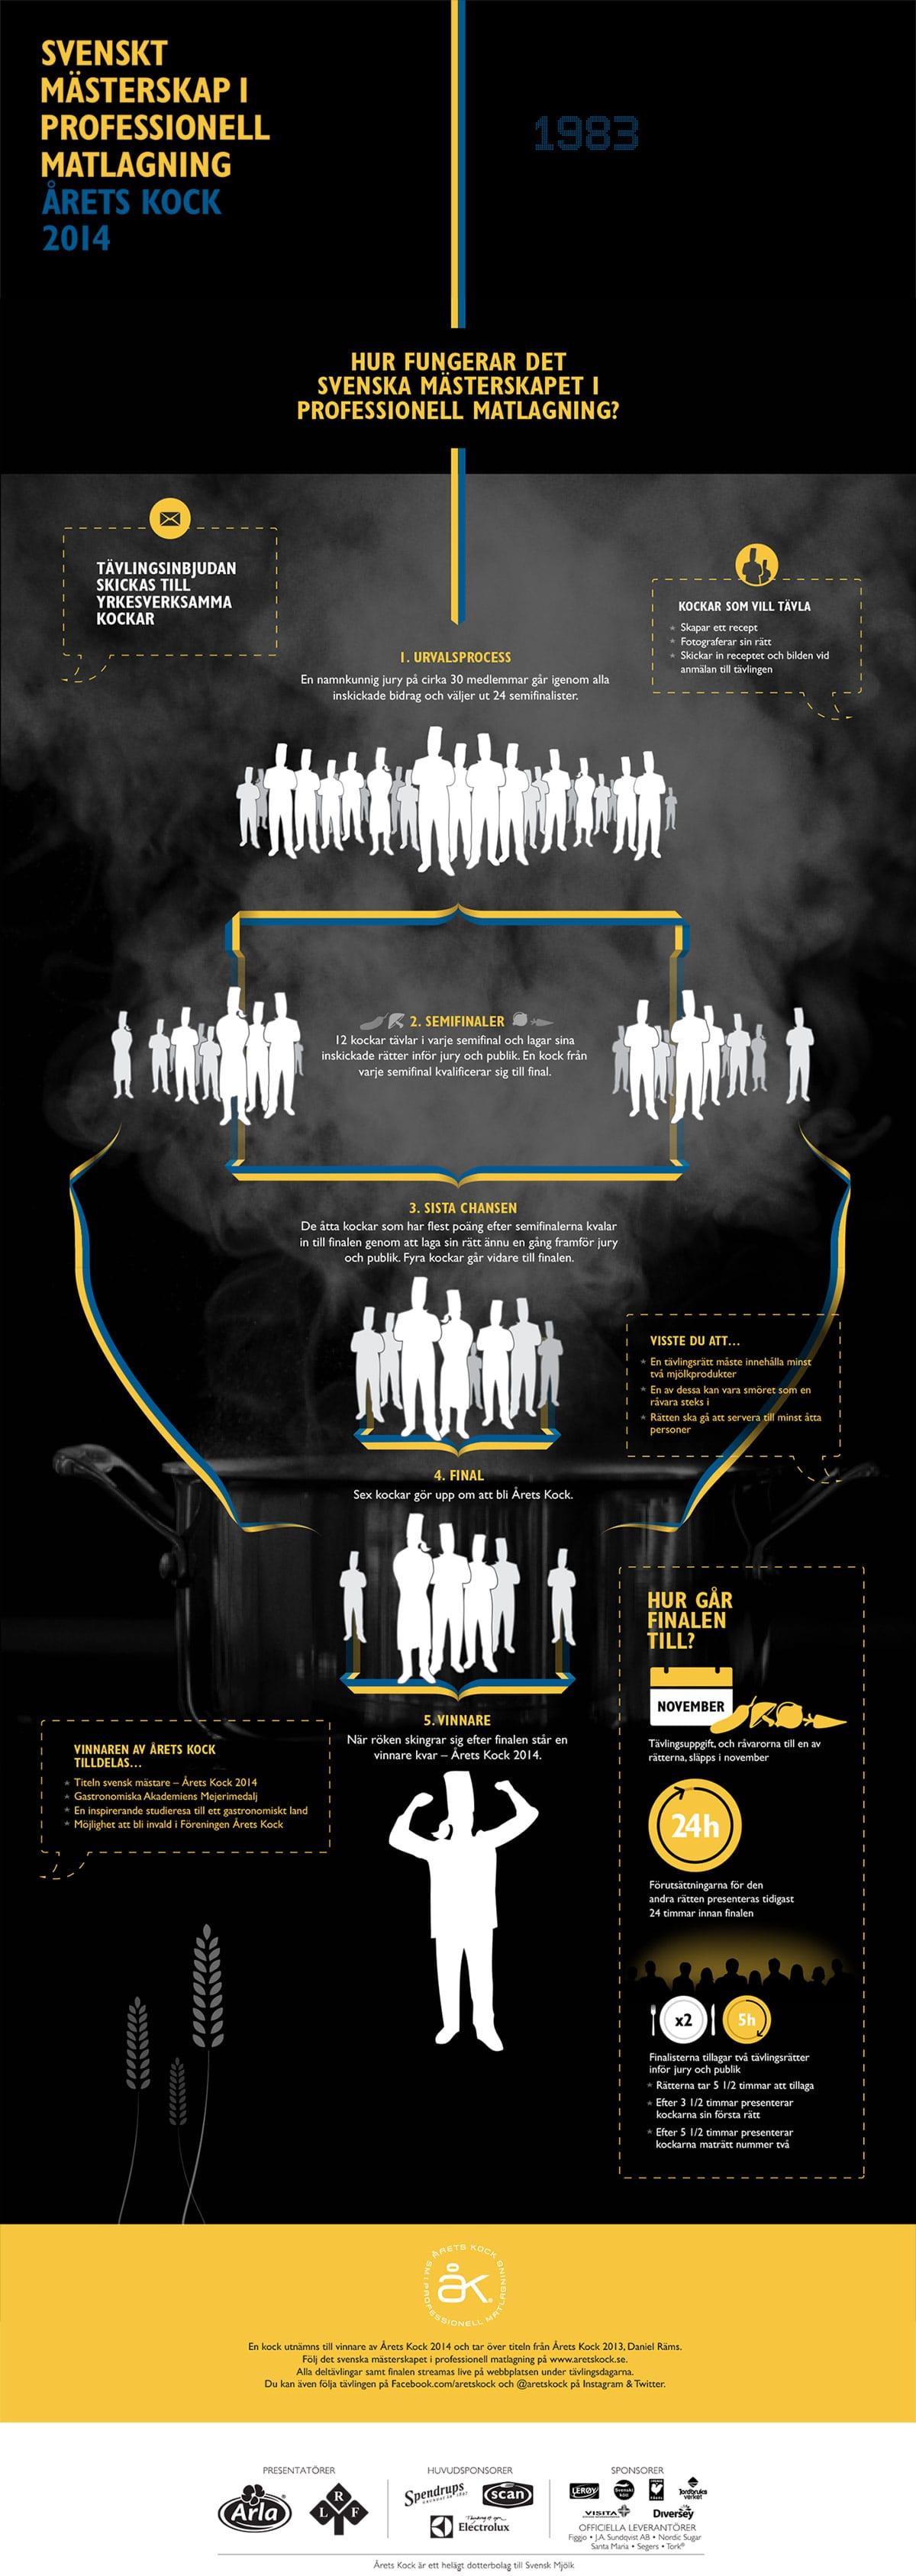 Årets Kock 2014 infografik